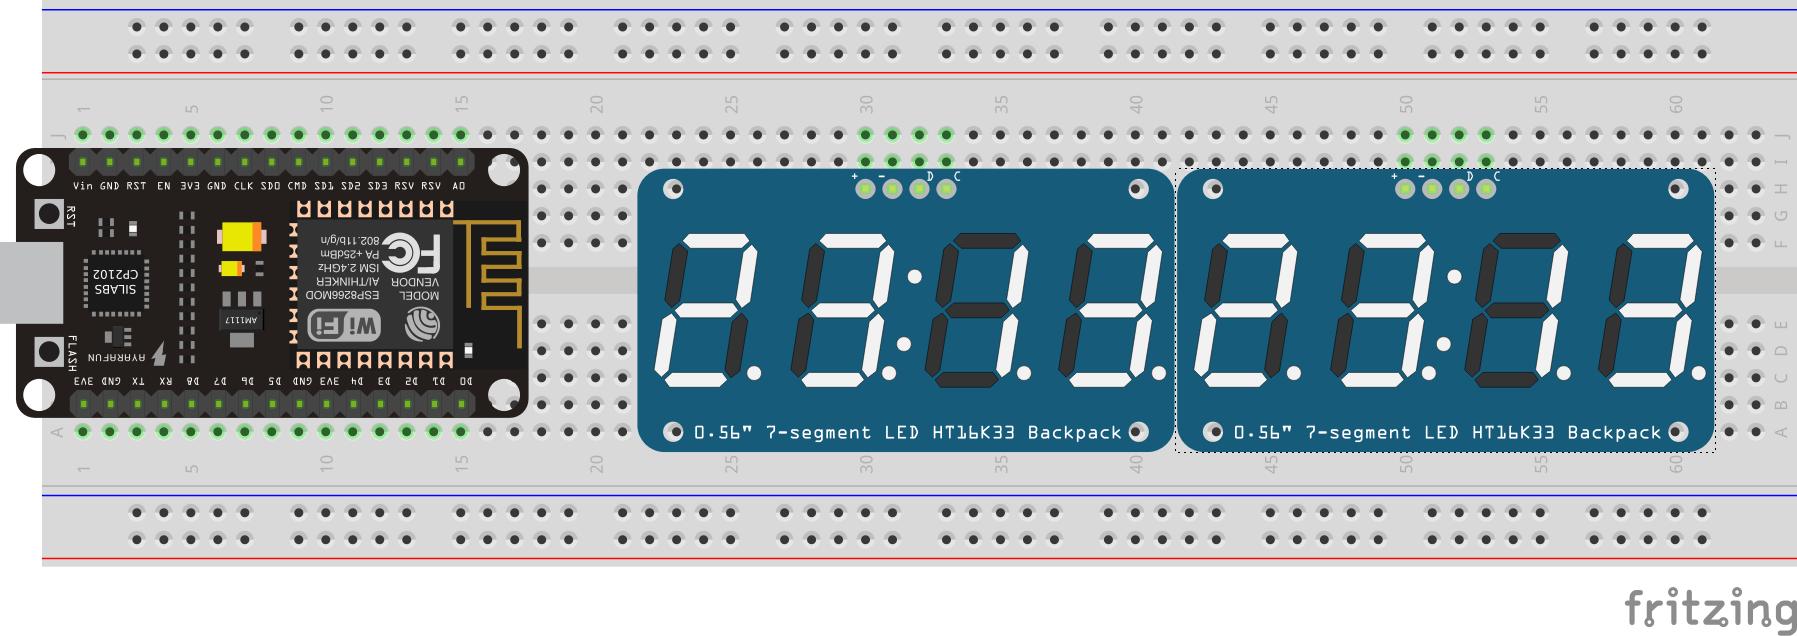 NodeMCU and 7-segment display diagram